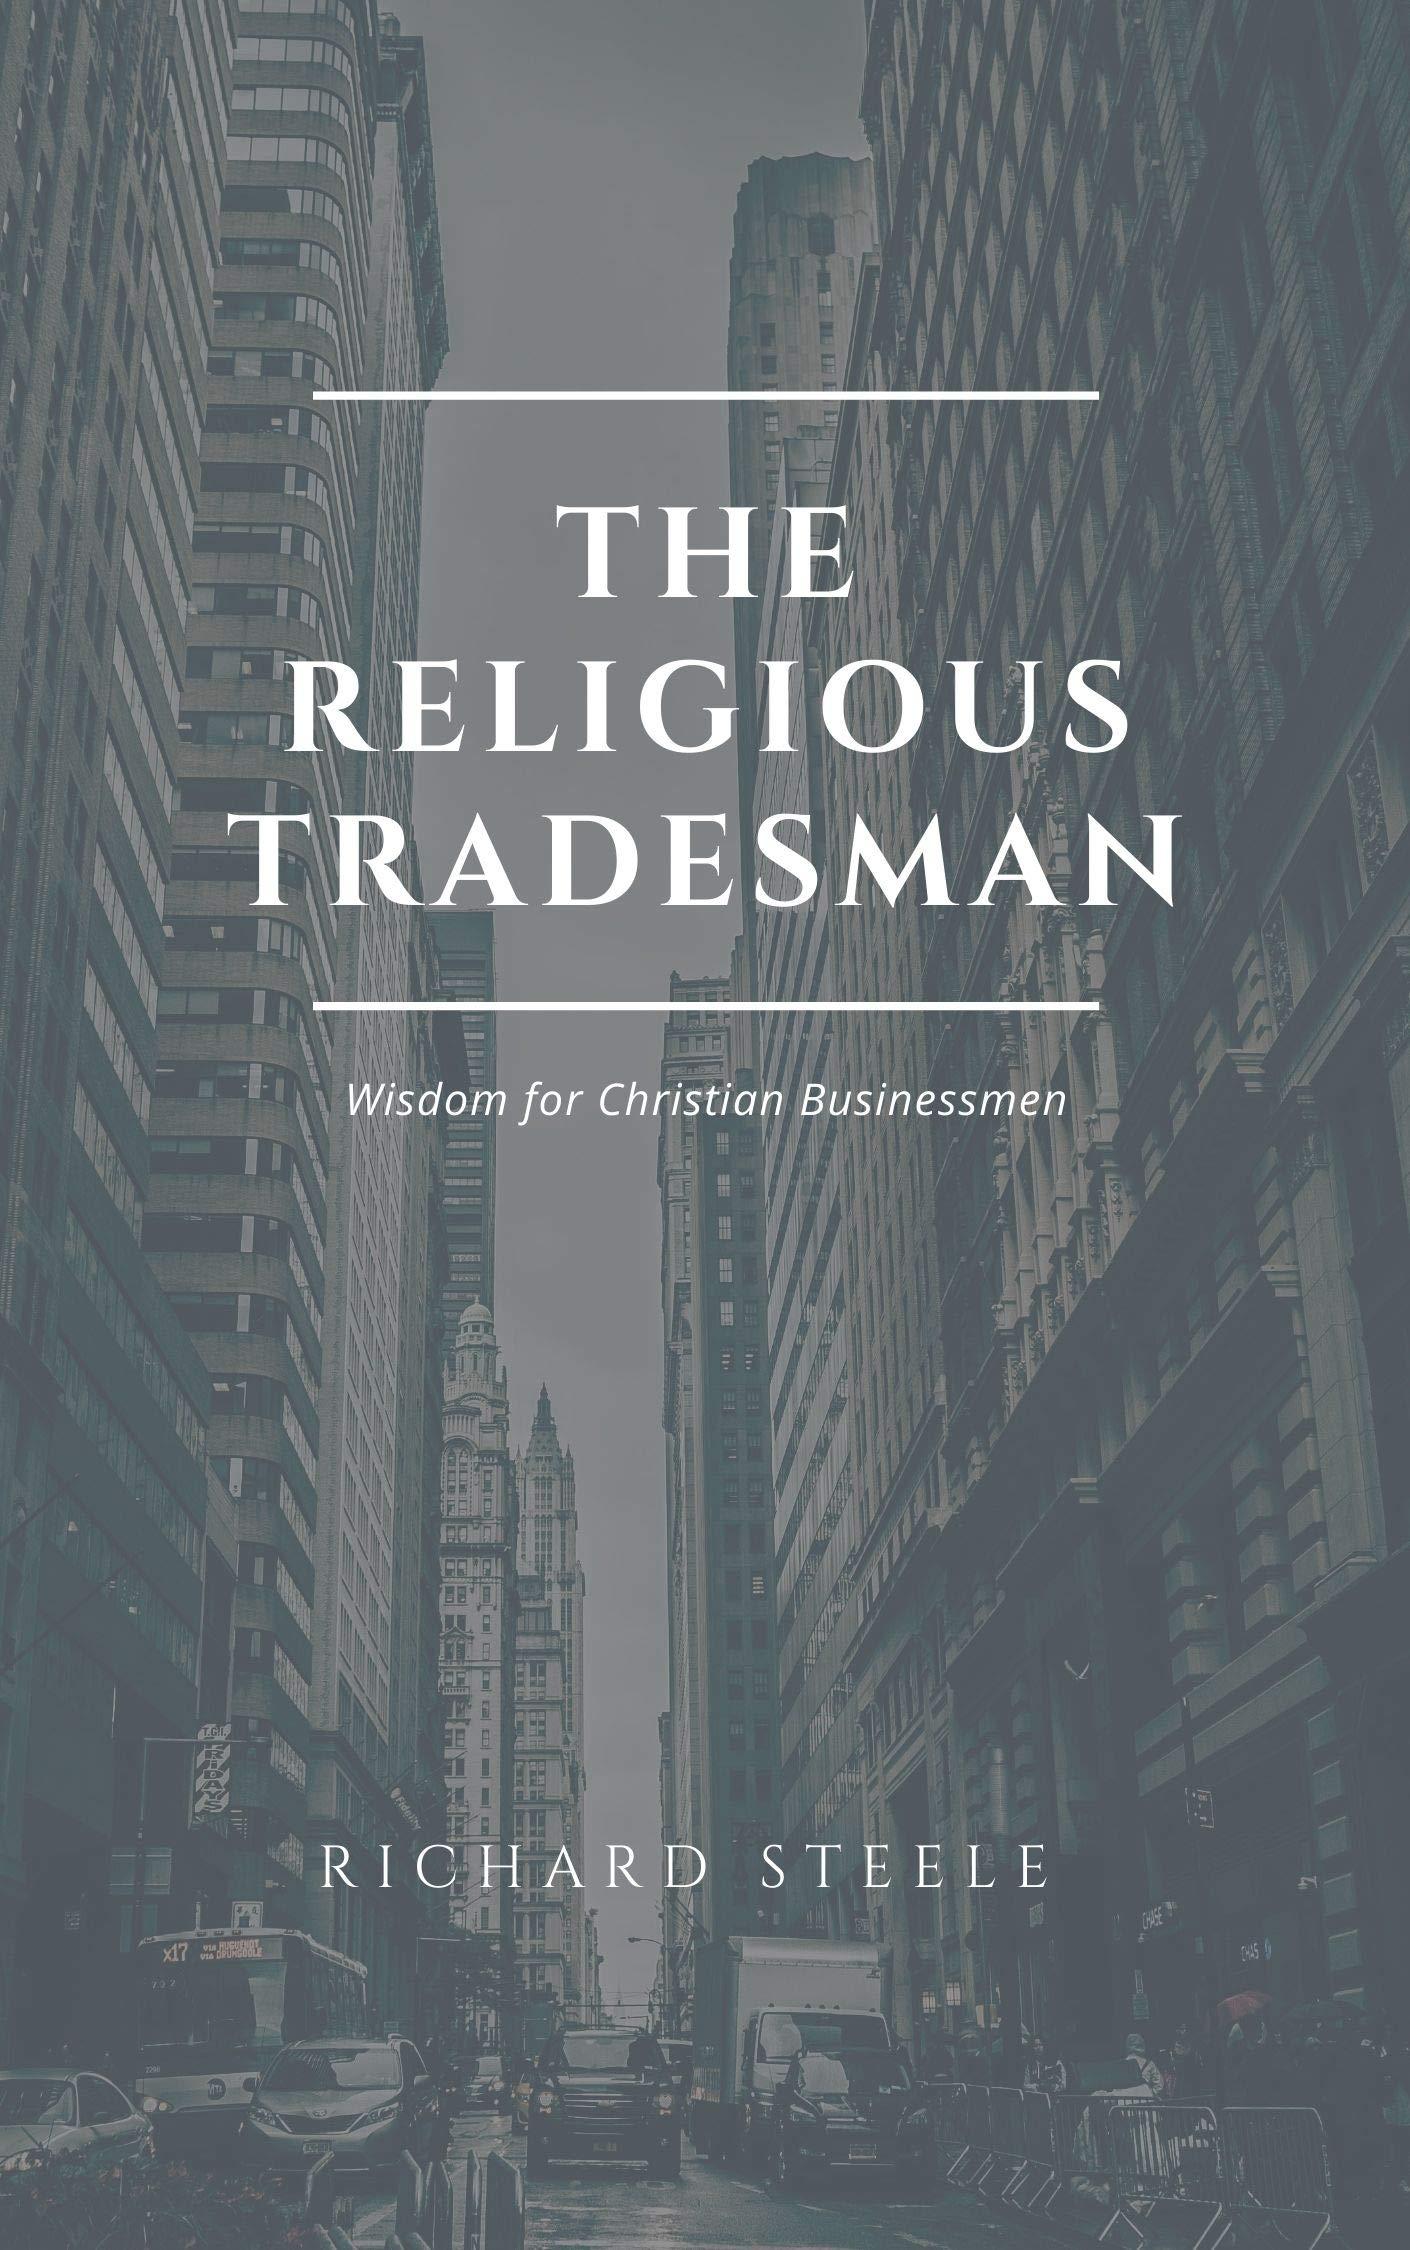 The Religious Tradesman: Wisdom for Christian Businessmen